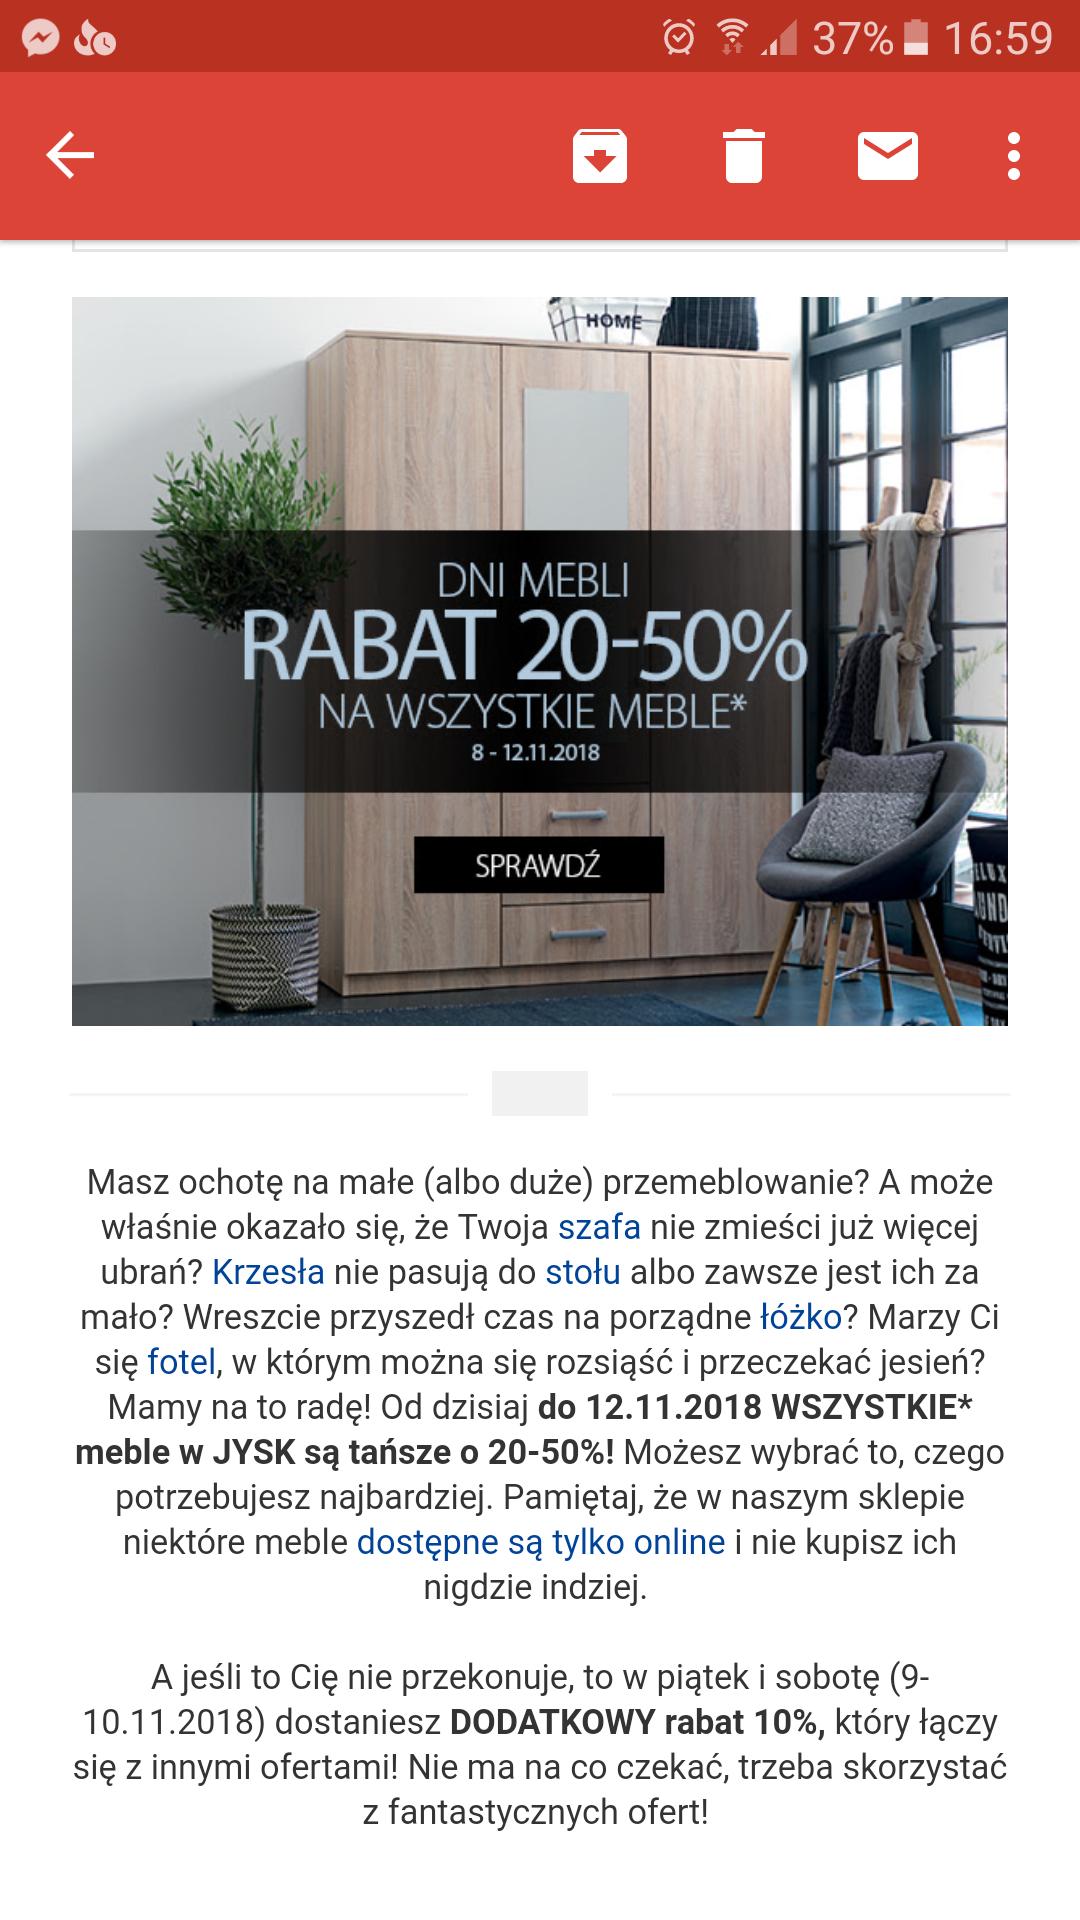 Jysk Rabat 20-50% na meble w JYSK!